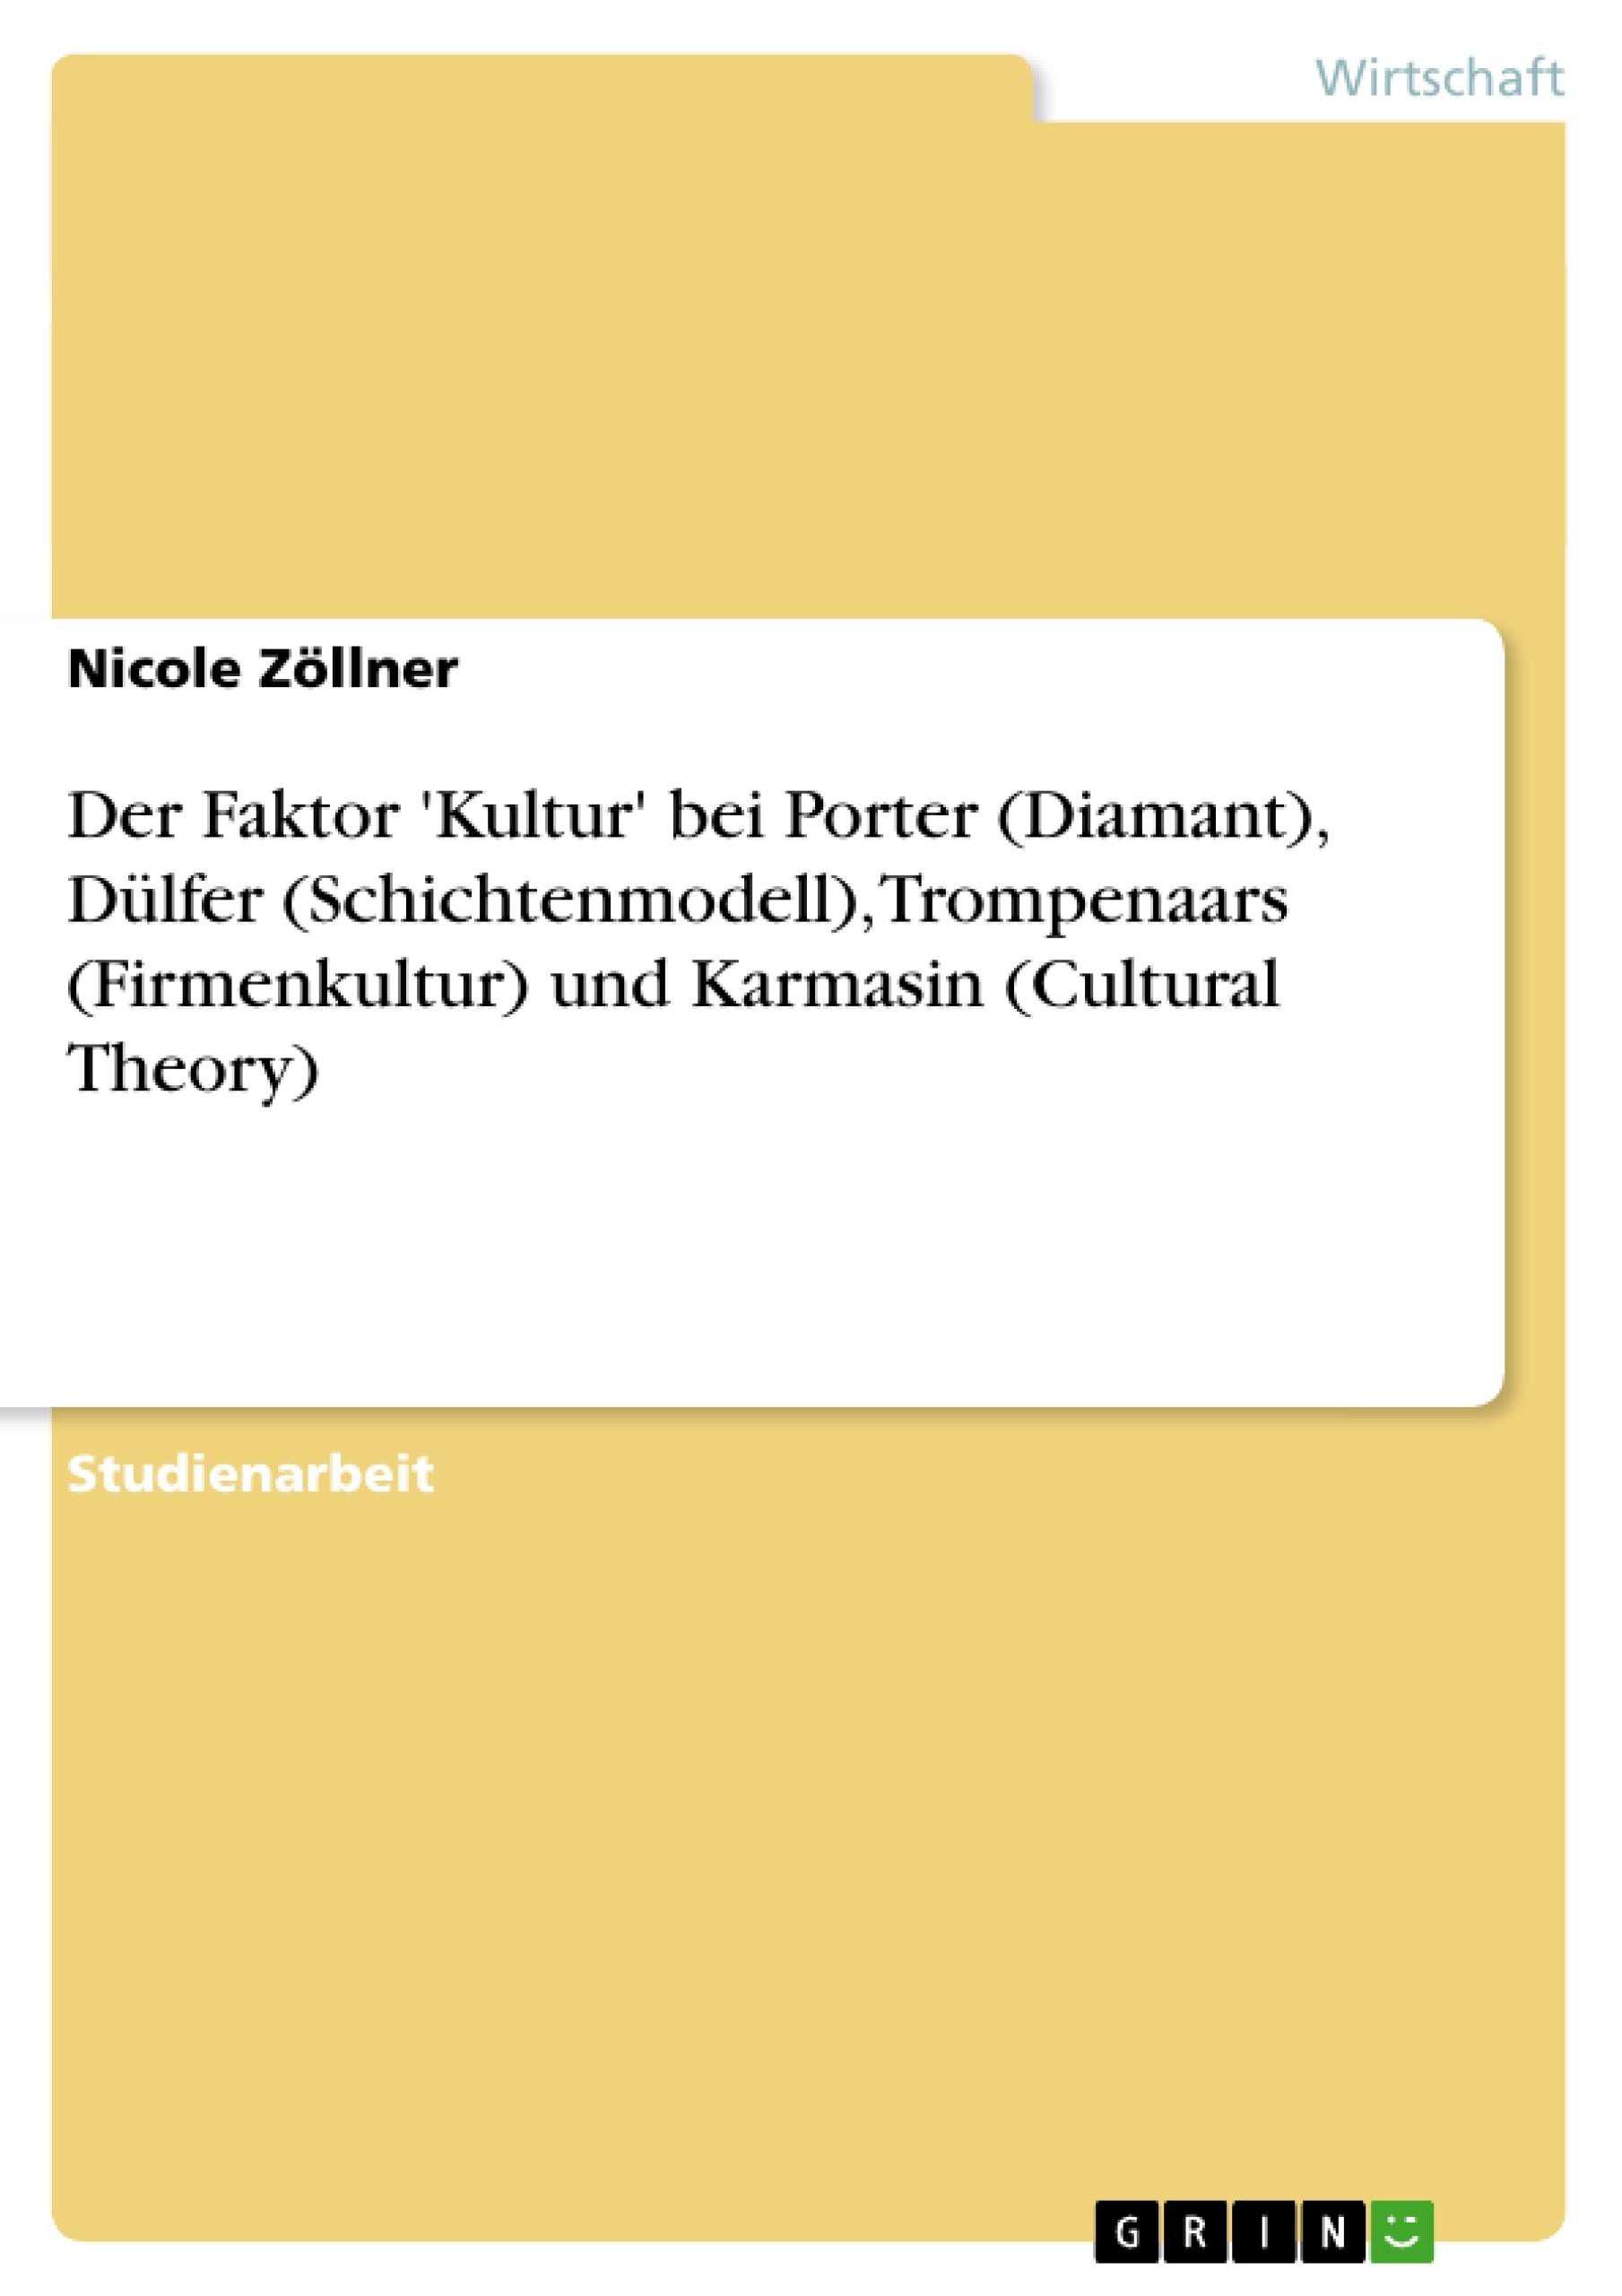 Titel: Der Faktor 'Kultur' bei Porter (Diamant), Dülfer (Schichtenmodell), Trompenaars (Firmenkultur) und Karmasin (Cultural Theory)